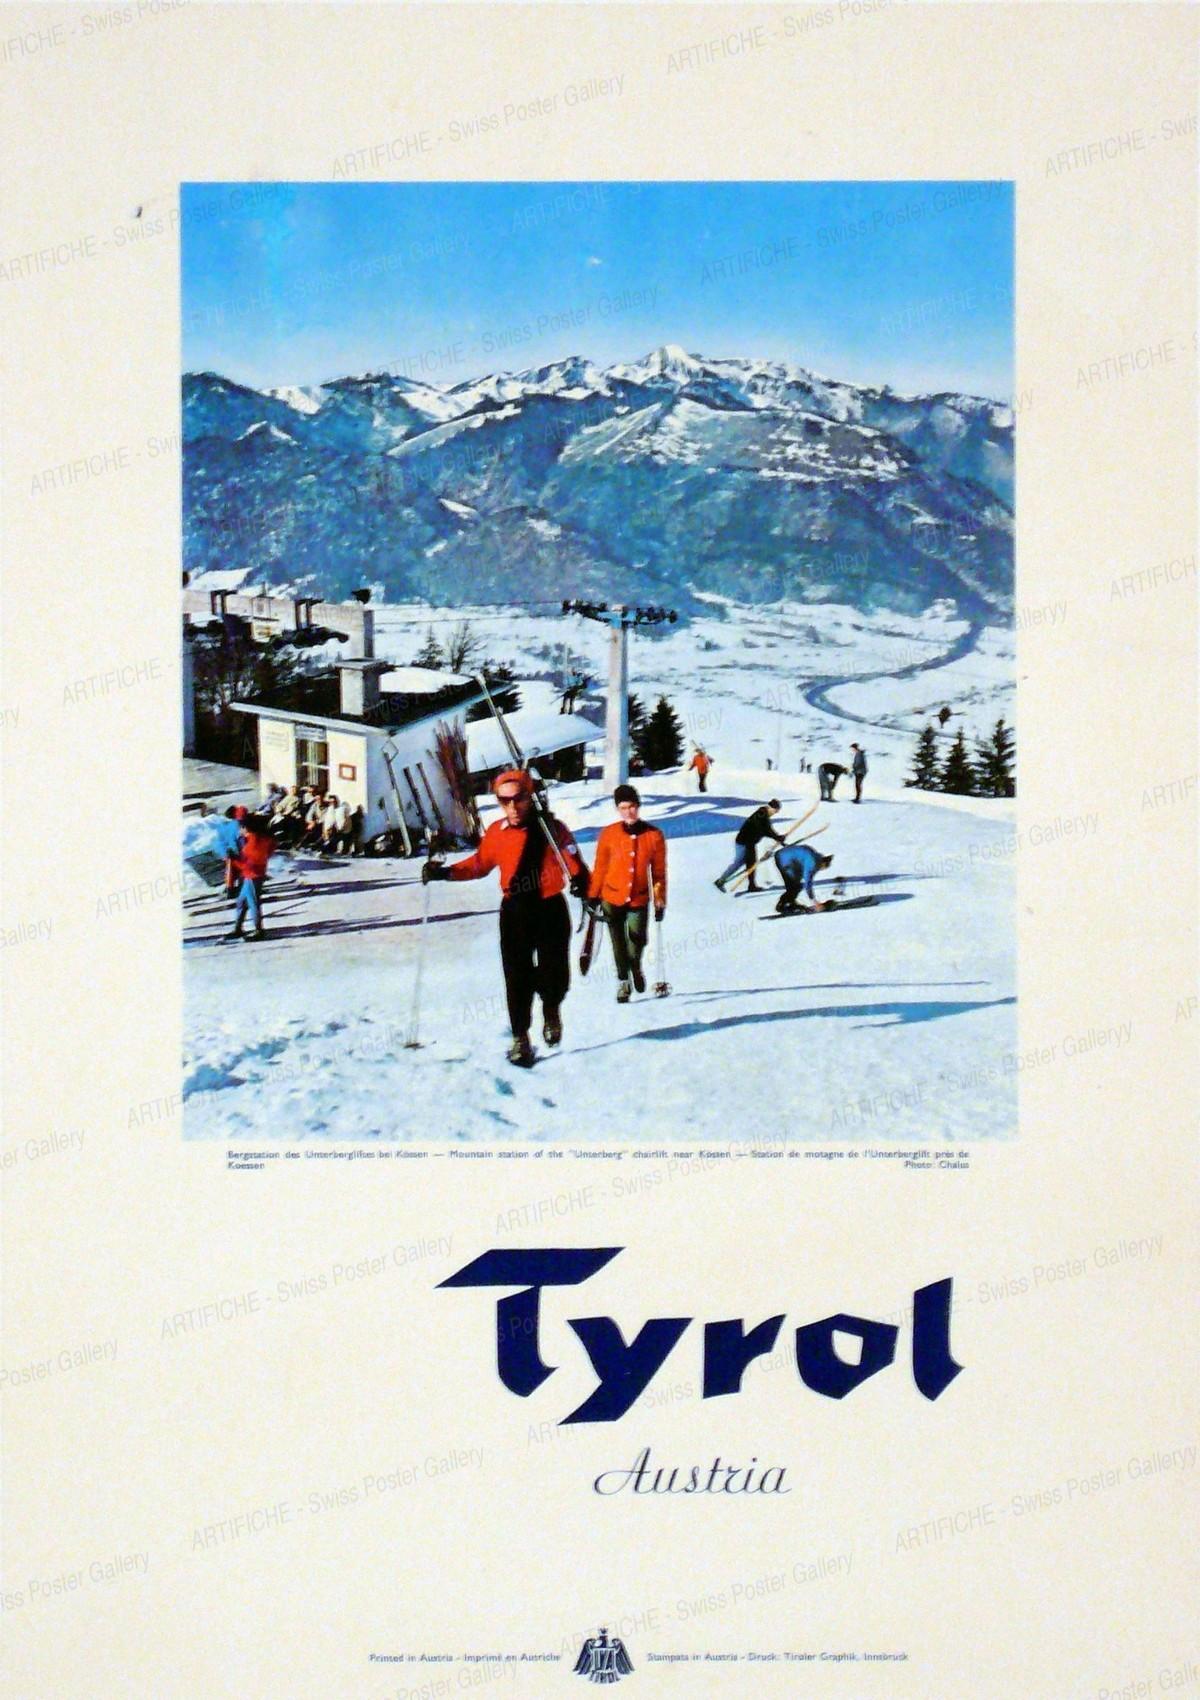 Tyrol Austria, Monogram B.P.